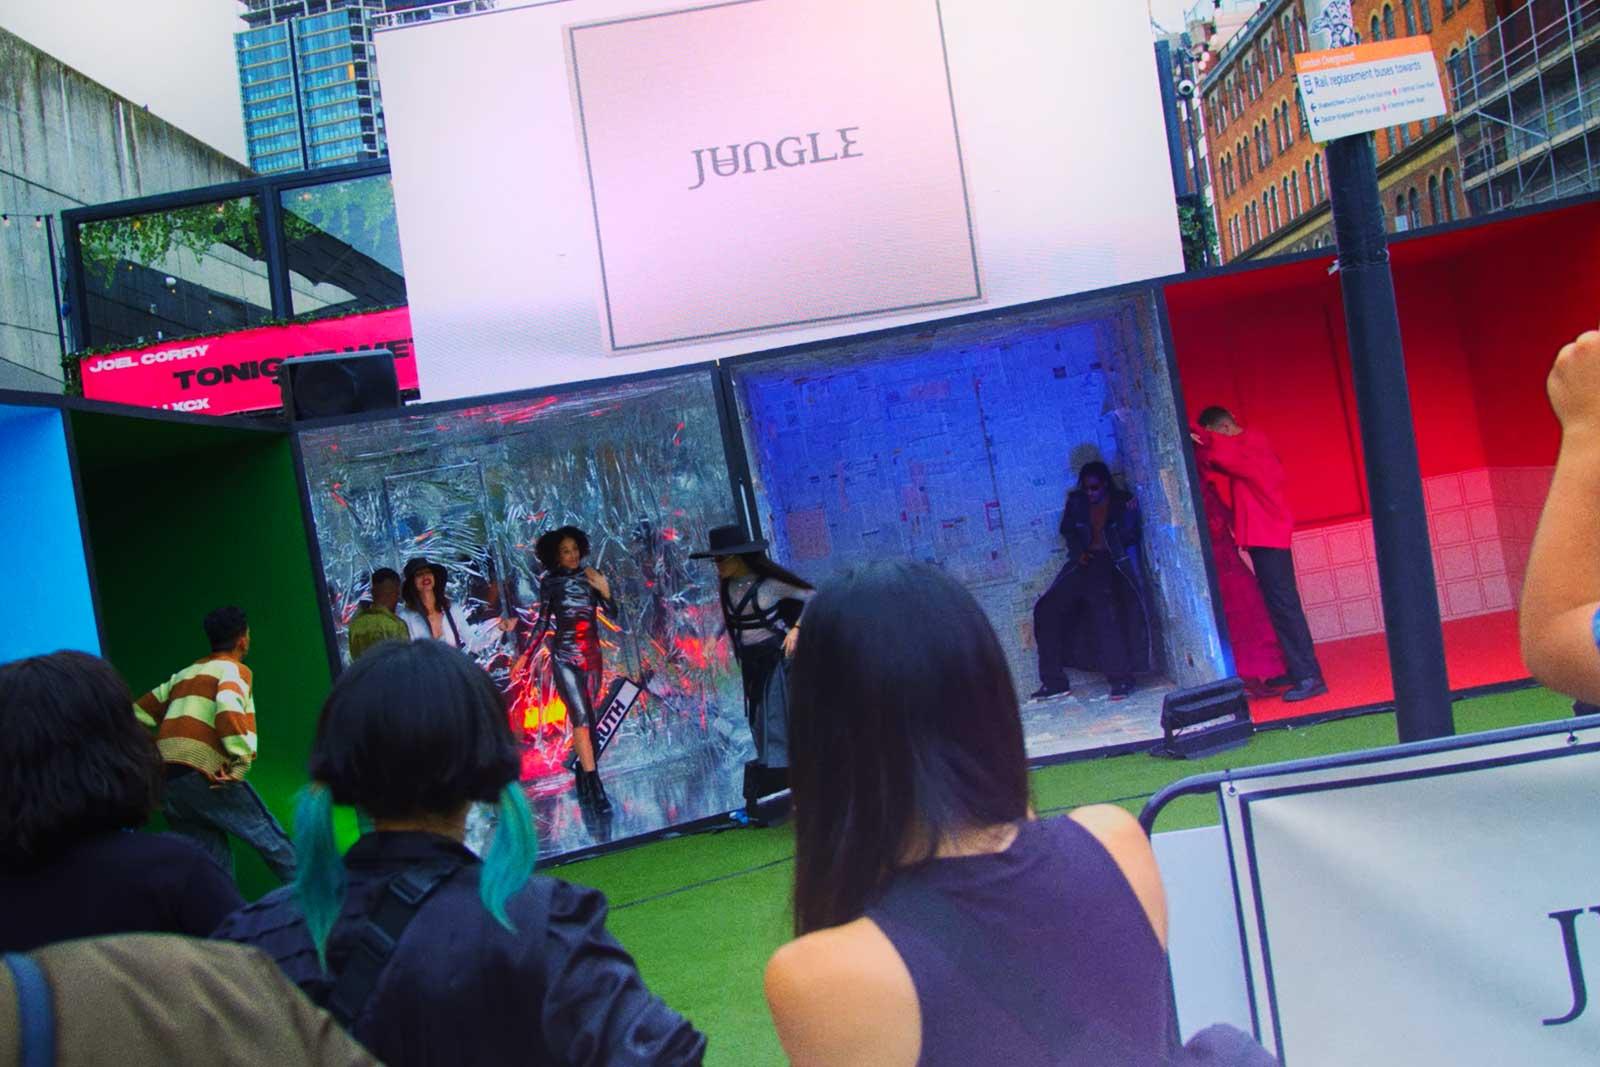 Jungle: Love In Stereo